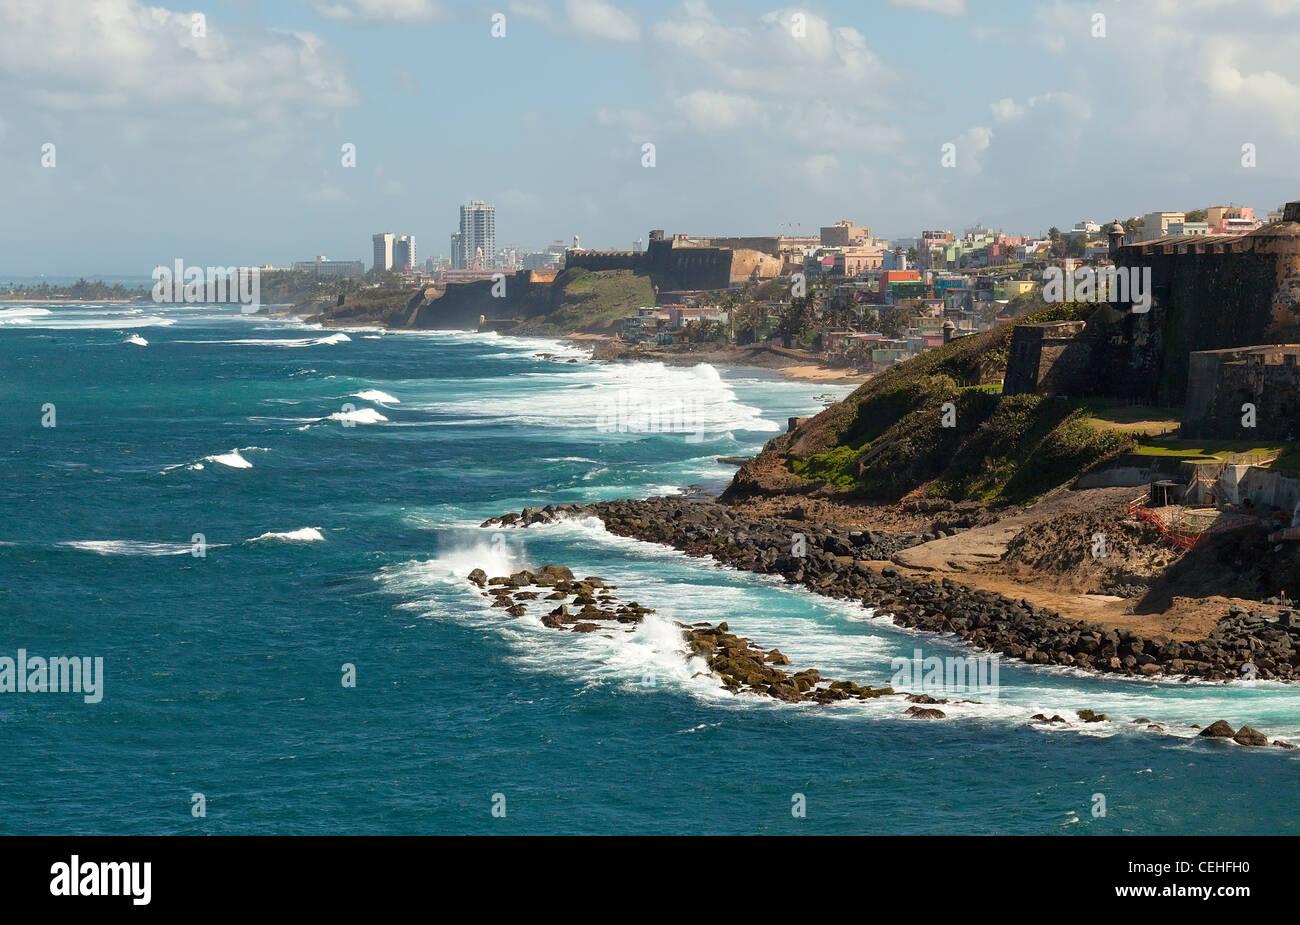 Litoral de San Juan, Puerto Rico Imagen De Stock